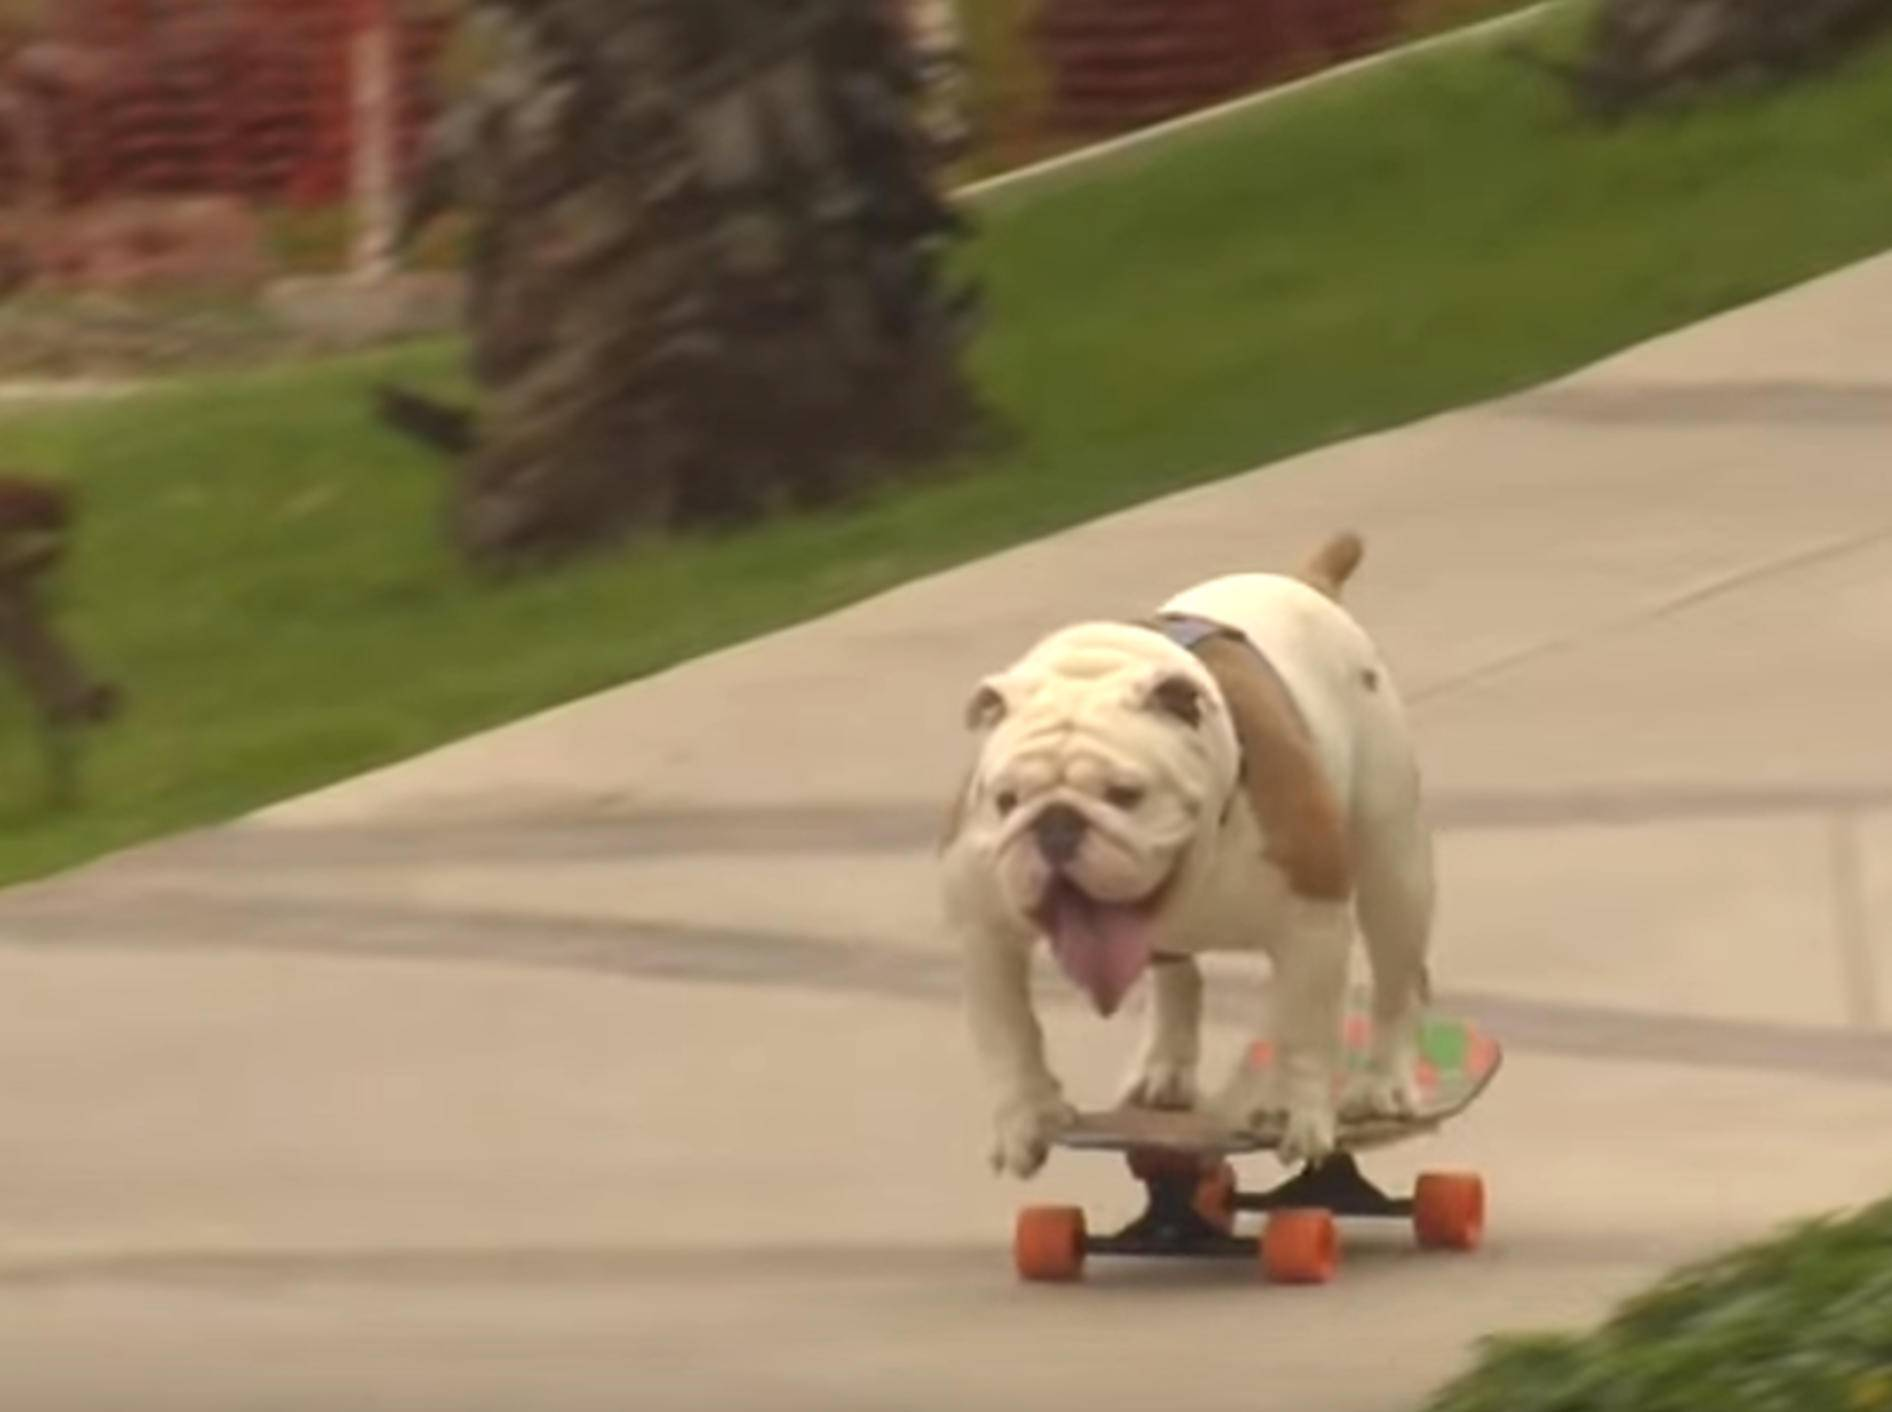 Bulldogge Otto bricht Weltrekord im Hunde-Skateboard-Fahren – Bild: YouTube / Guinness World Records